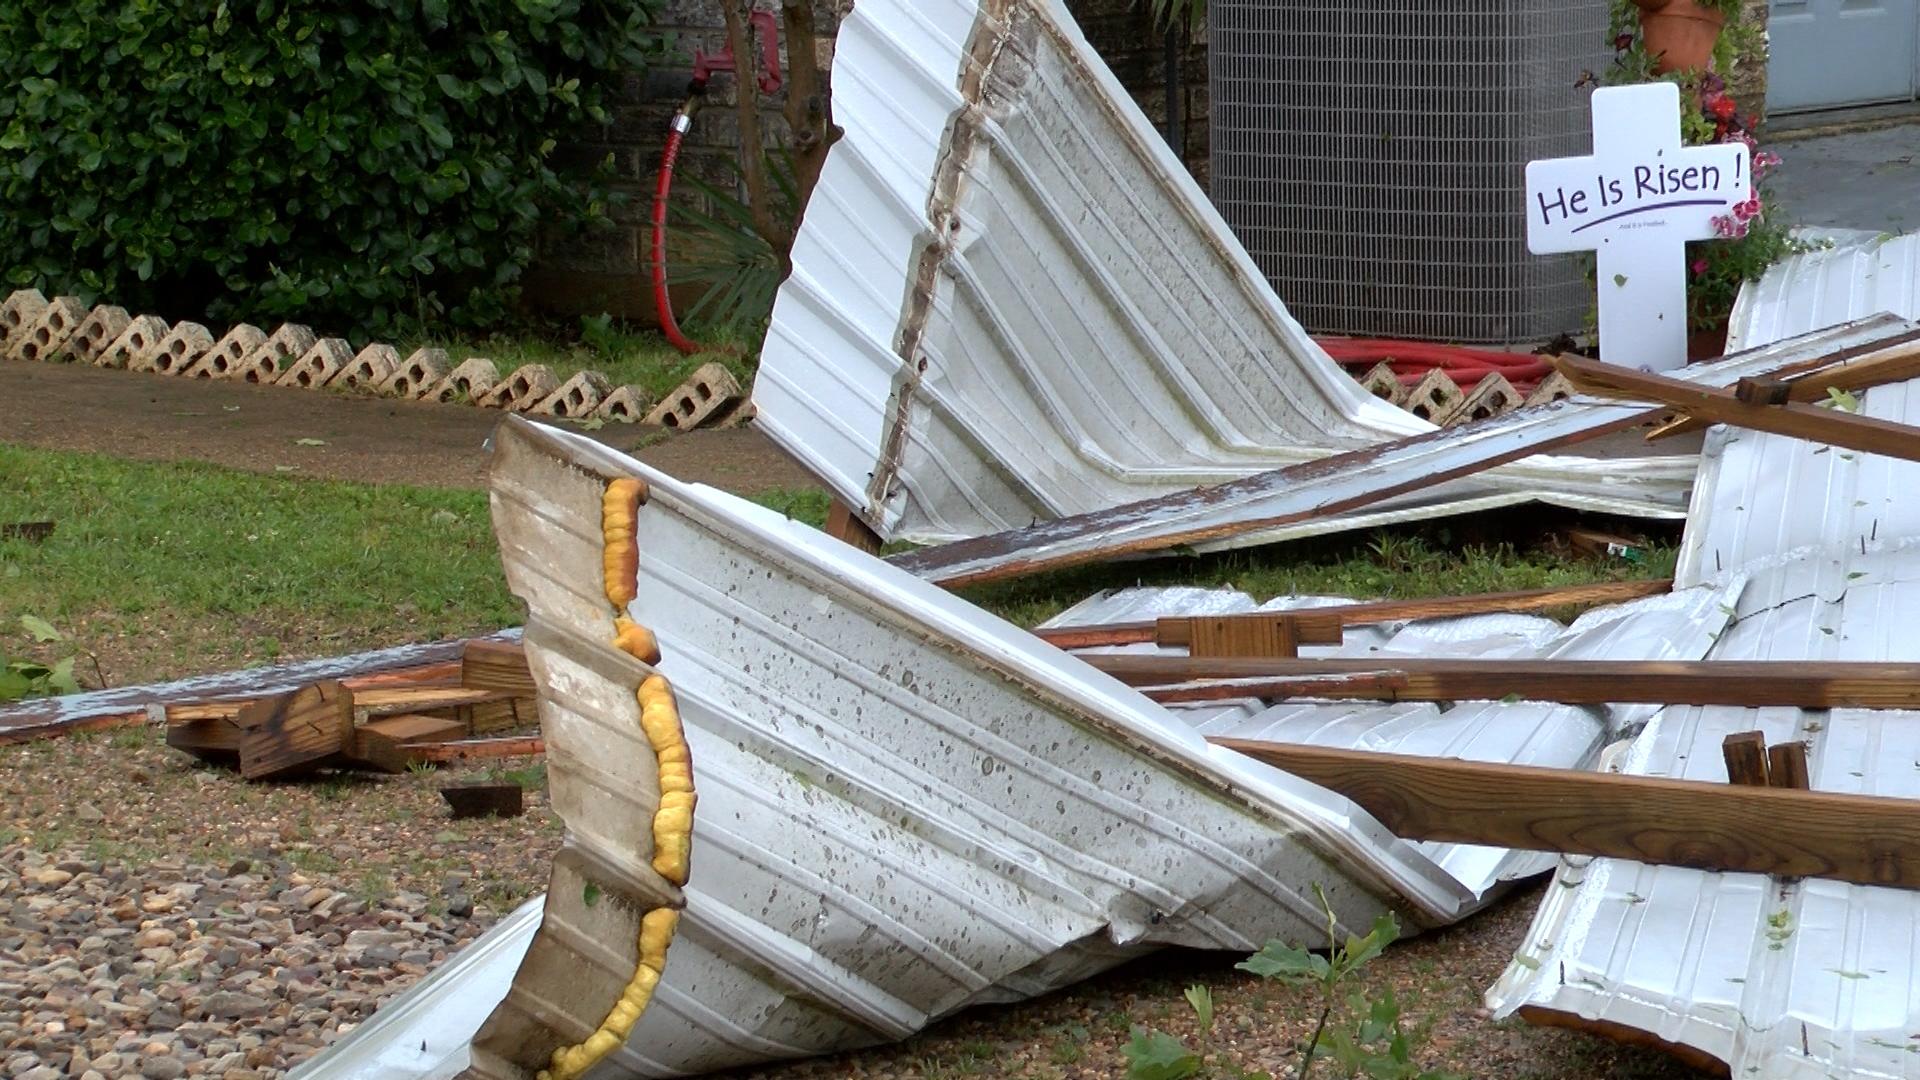 church damage_1555624701980.jpg-22991016.jpg